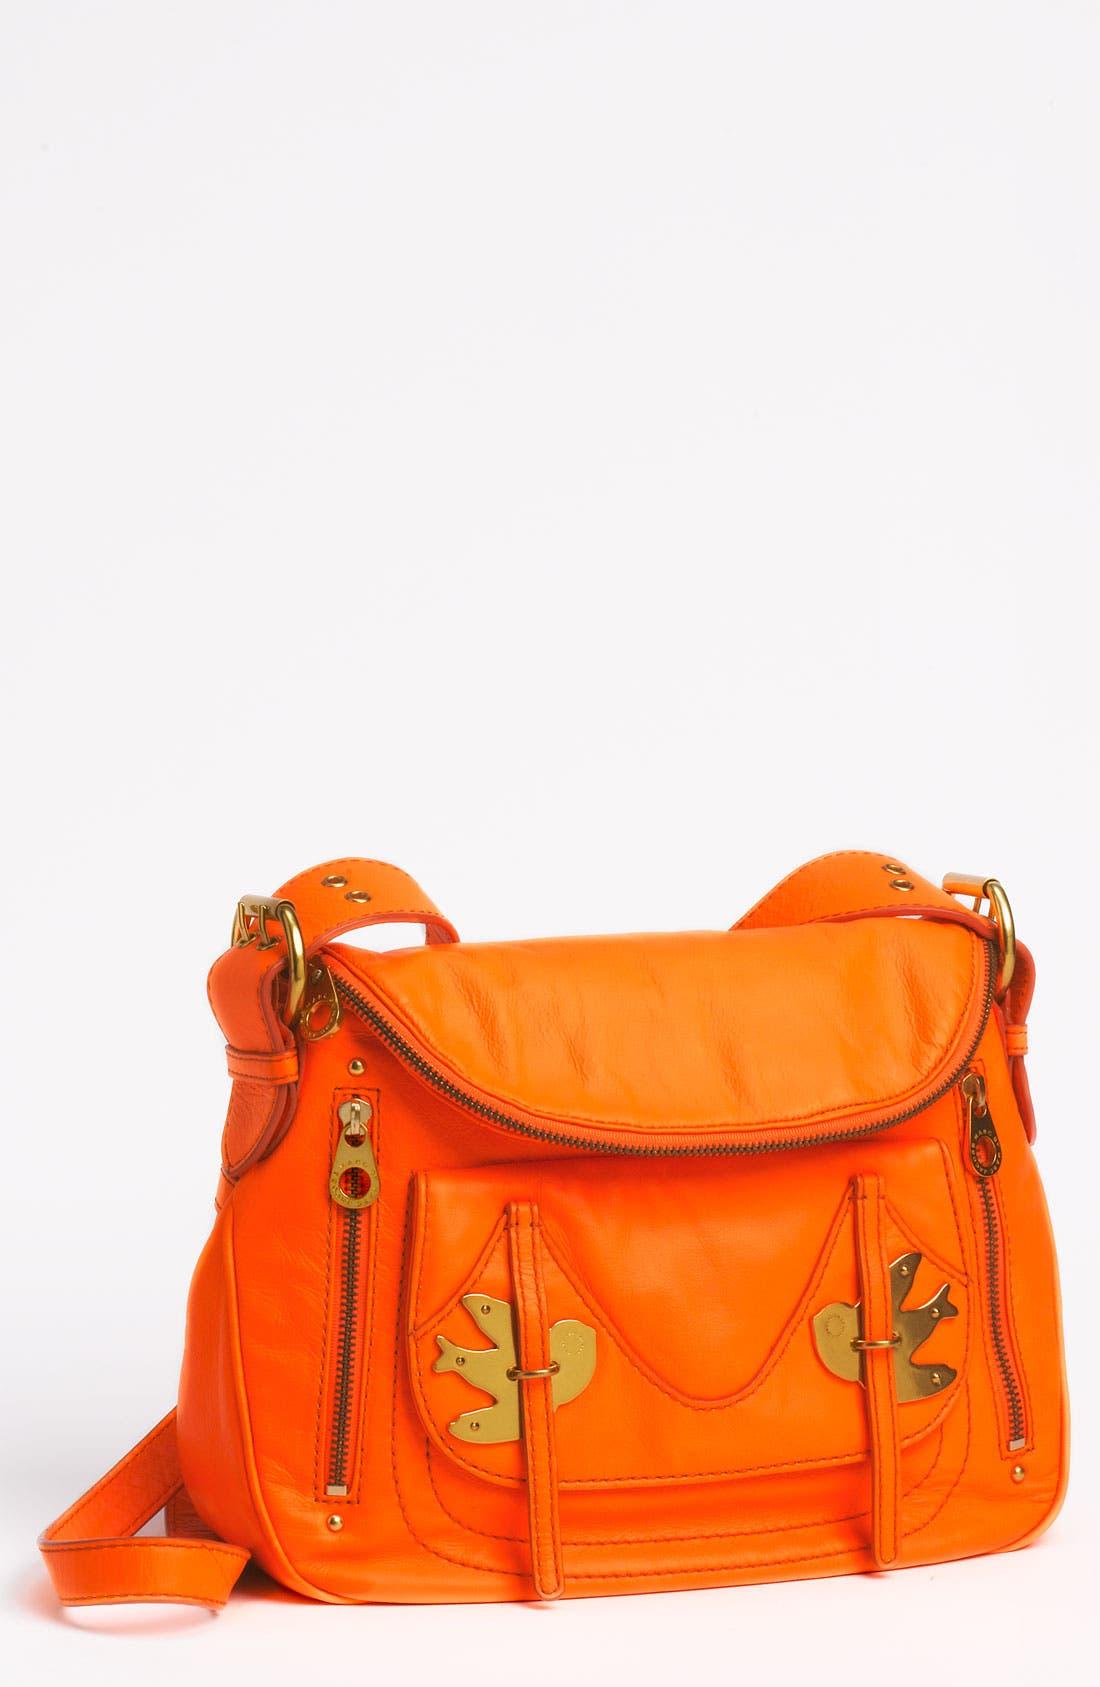 Alternate Image 1 Selected - MARC BY MARC JACOBS 'Petal to the Metal - Natasha' Flap Crossbody Bag, Medium